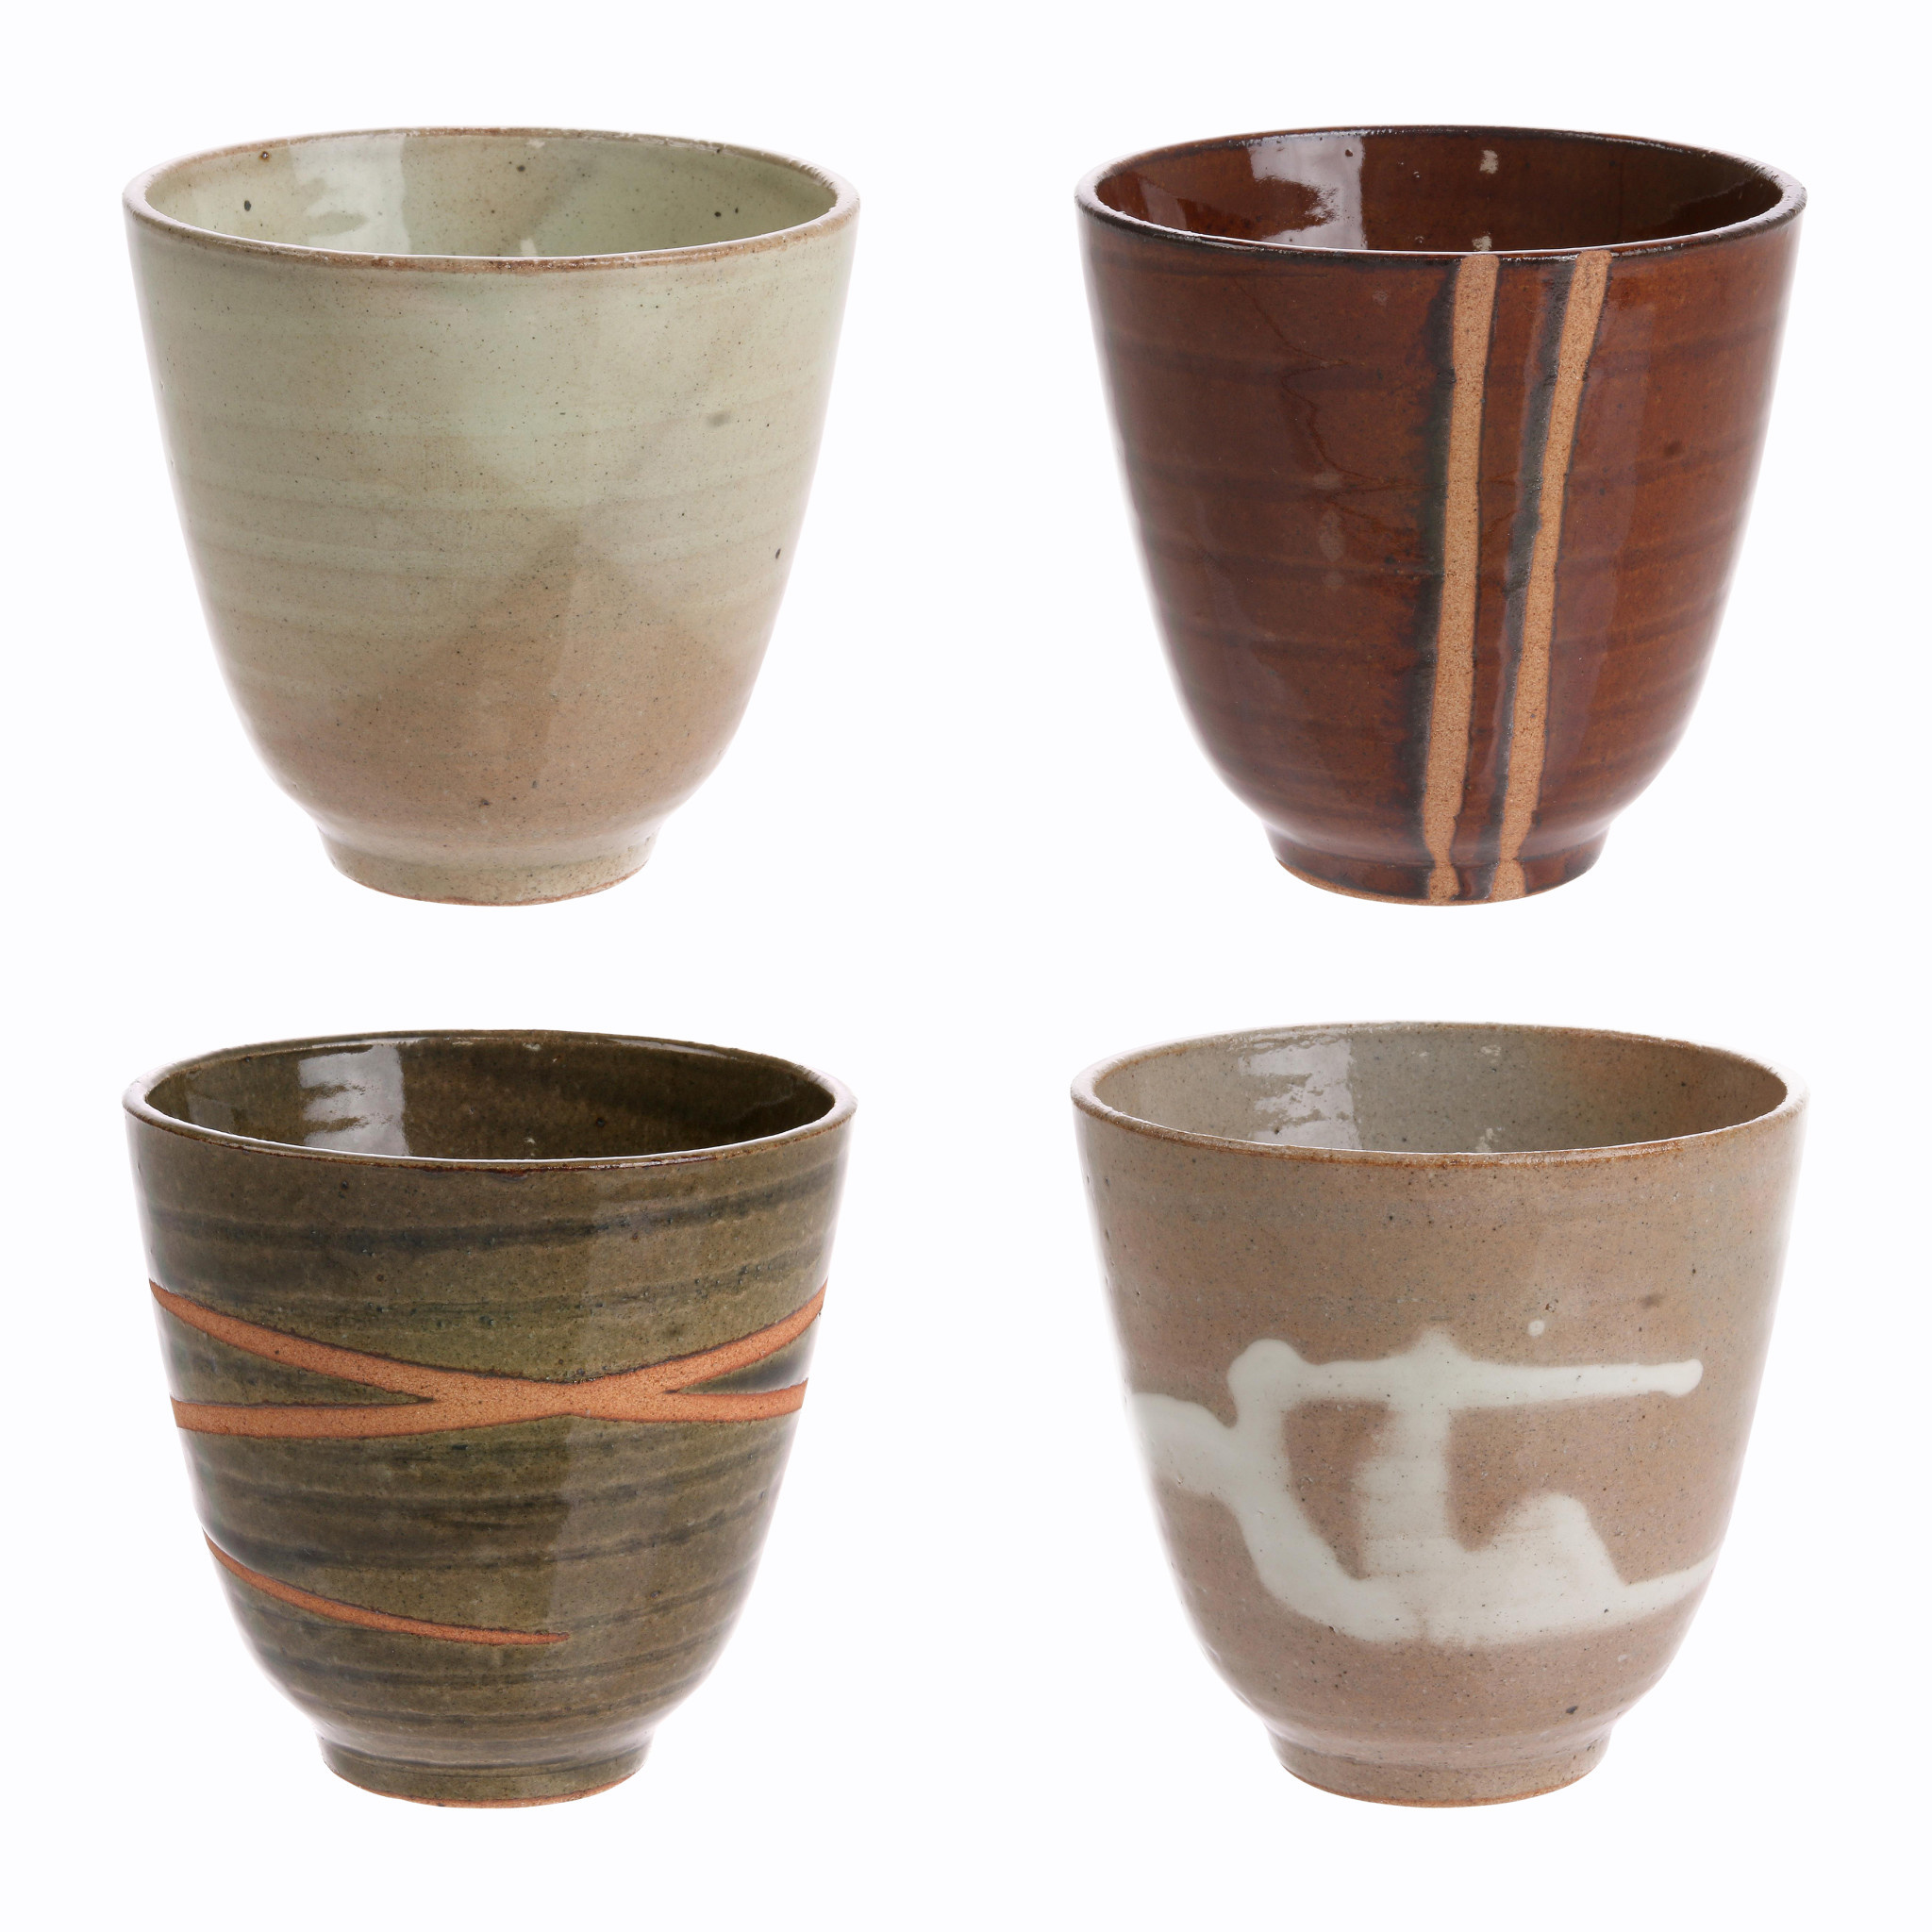 Mok kyoto ceramics: japanese yunomi mugs light pink-2